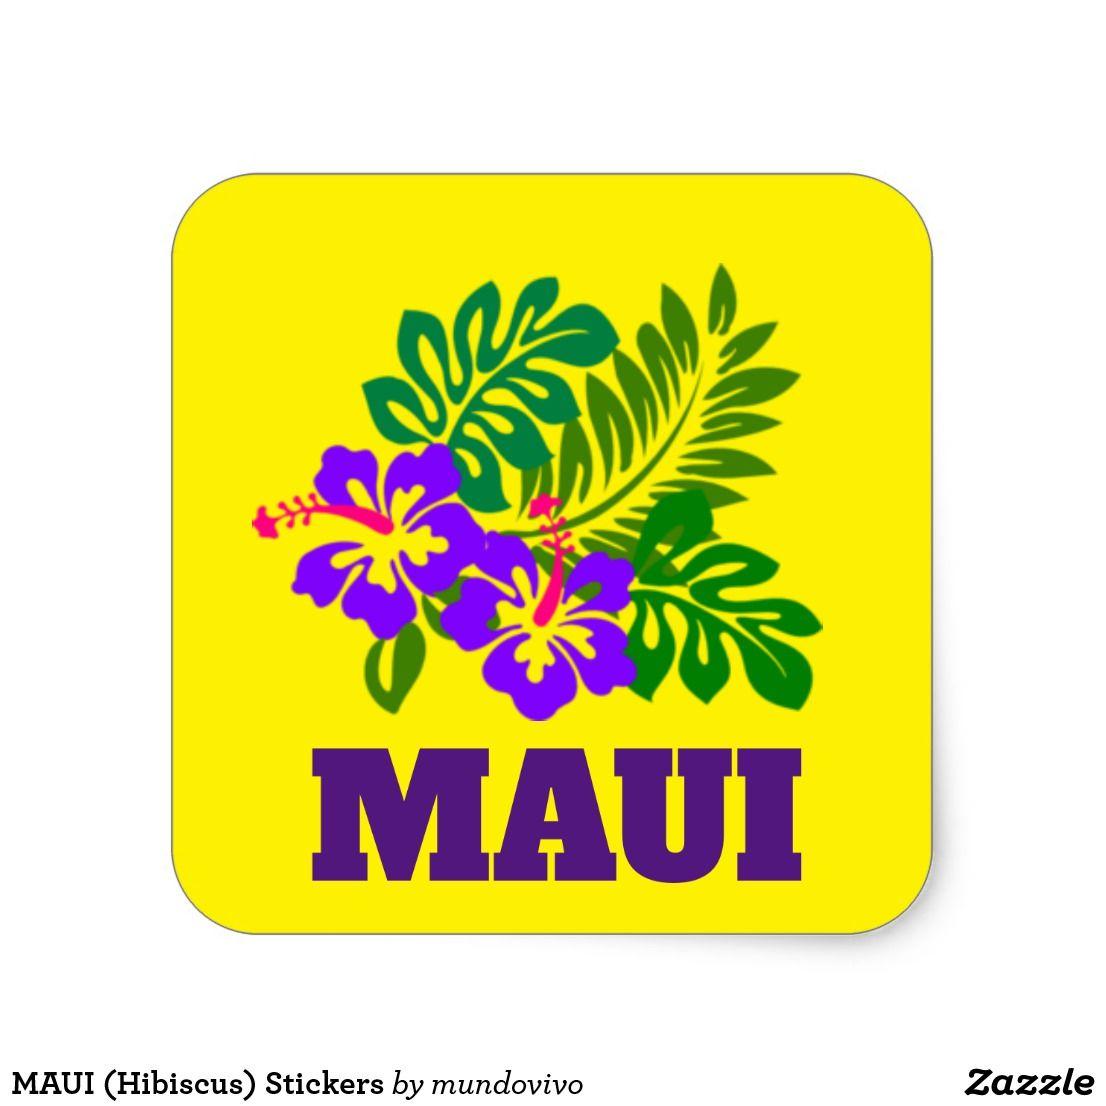 Maui Hibiscus Stickers Zazzle Com Maui Gift Hibiscus Create Custom Stickers [ 1106 x 1106 Pixel ]